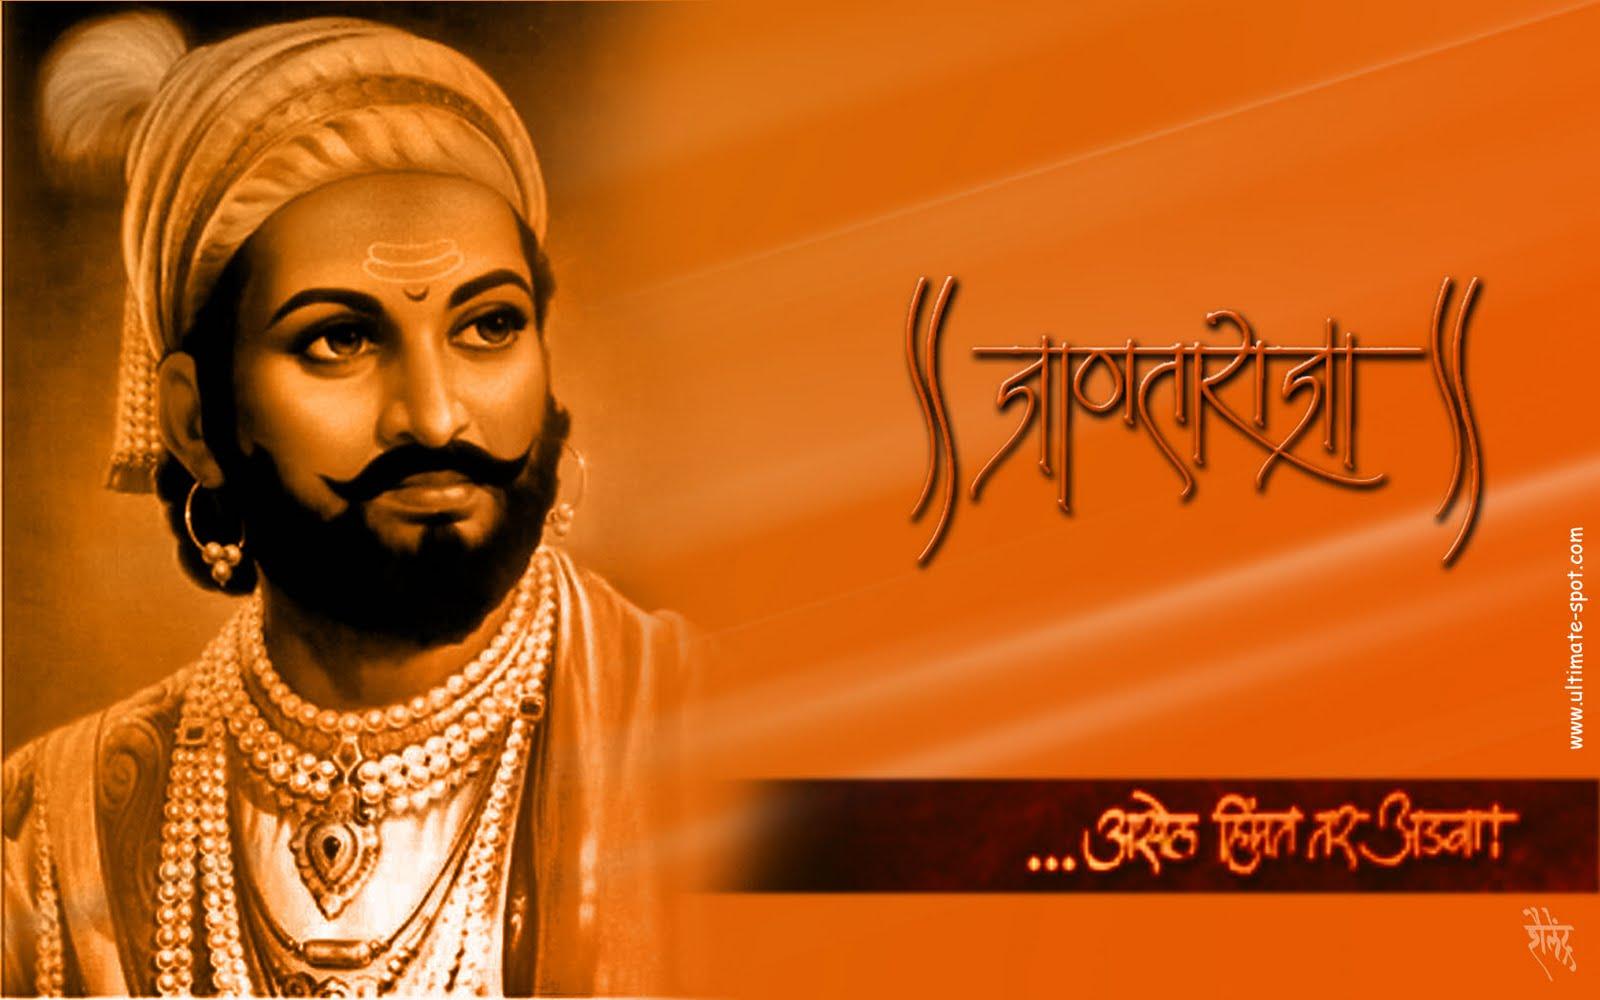 Hd wallpaper shivaji maharaj - Hd Wallpaper Shivaji Maharaj 57